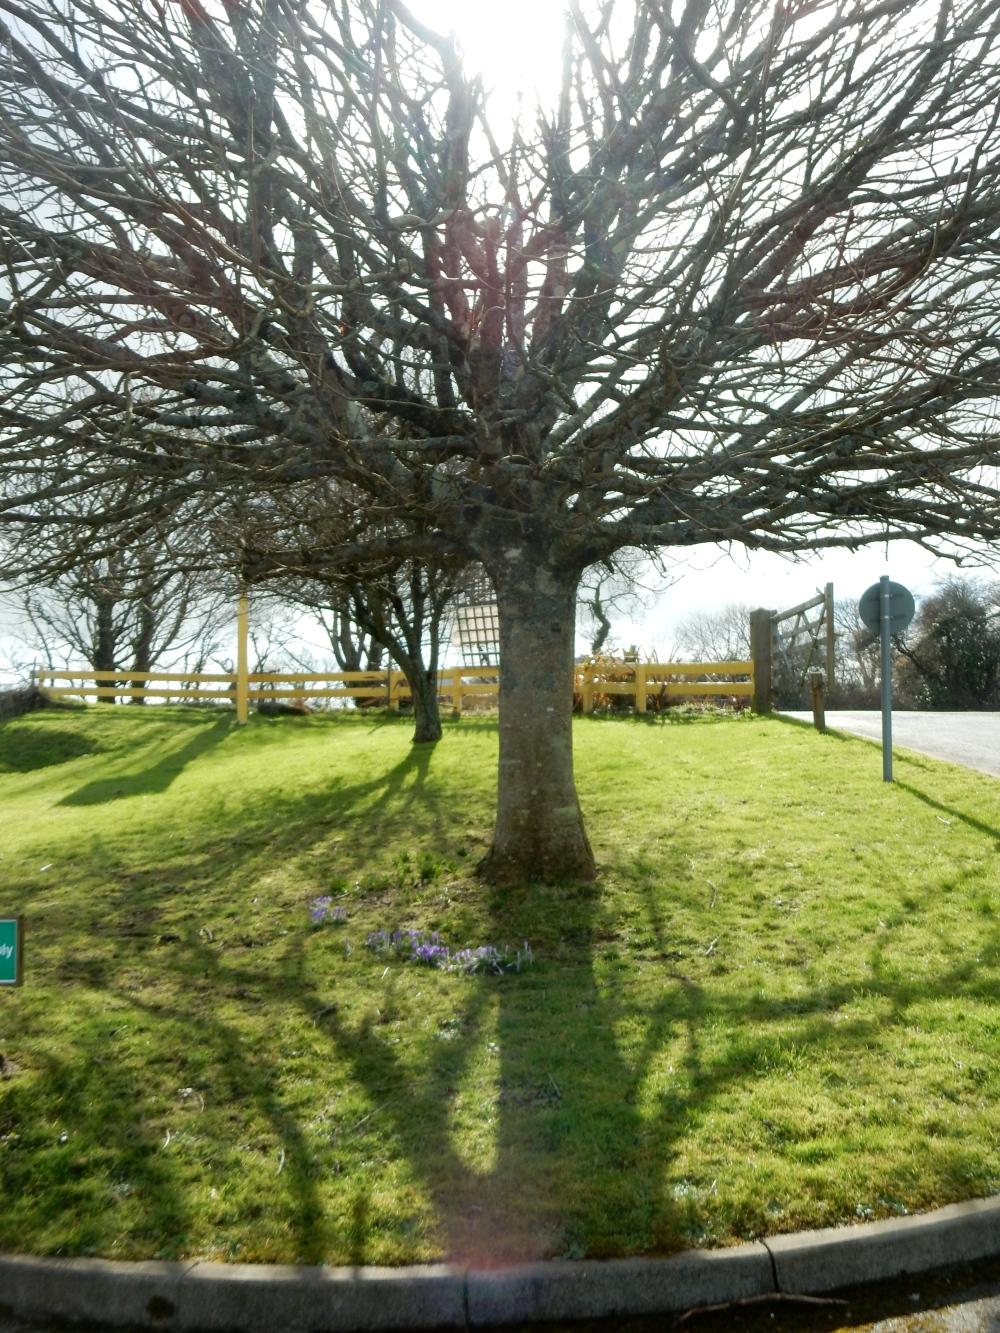 Tree and crocuses